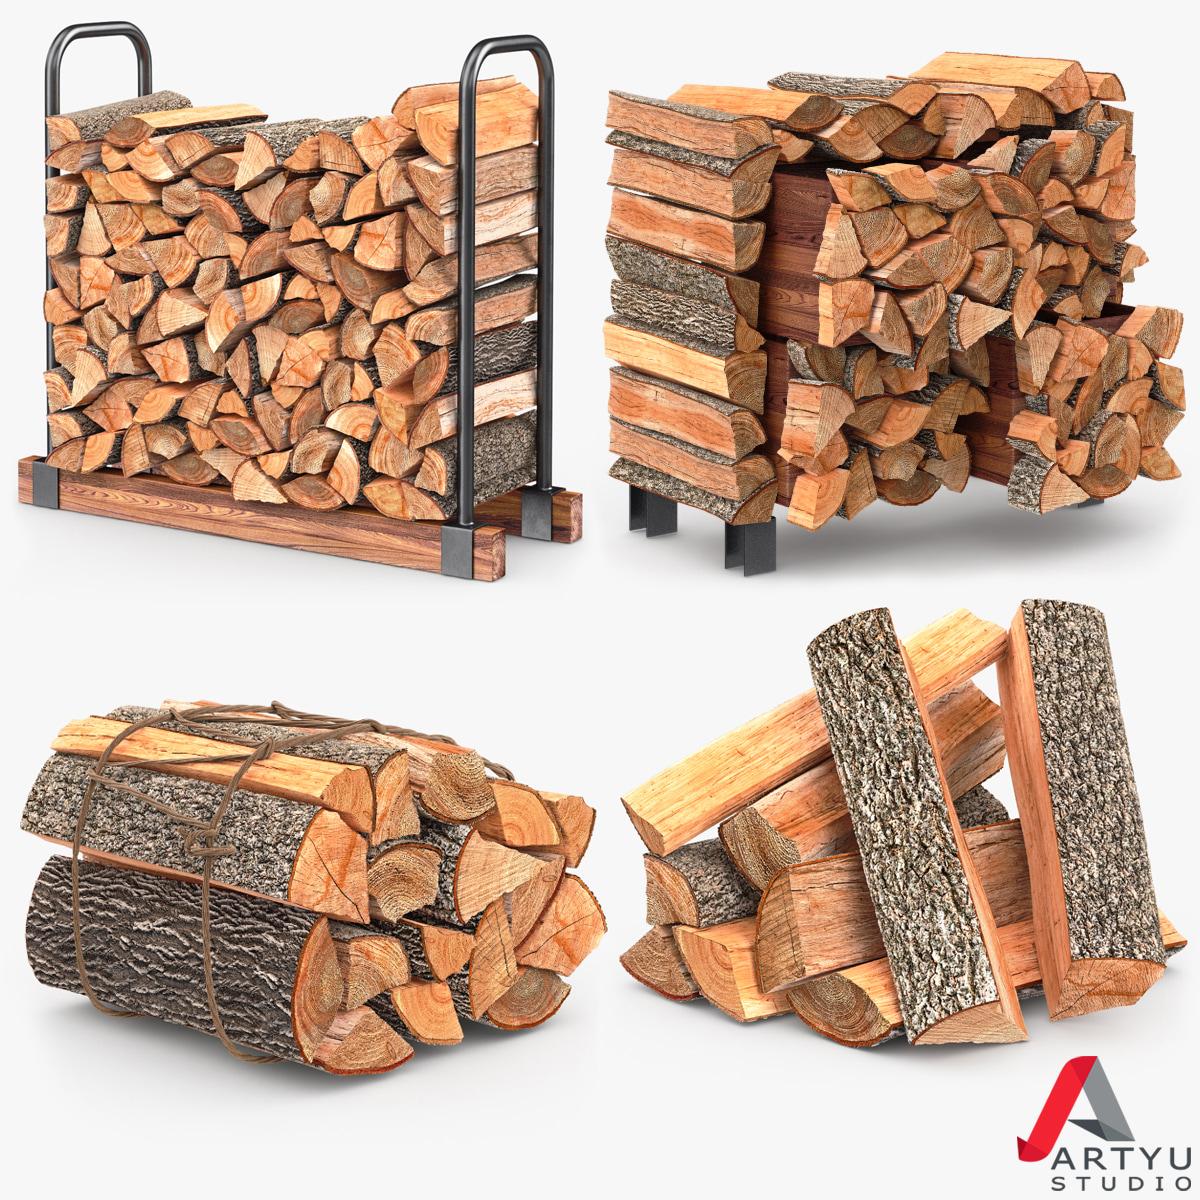 1_Firewood Stack, Set.jpg